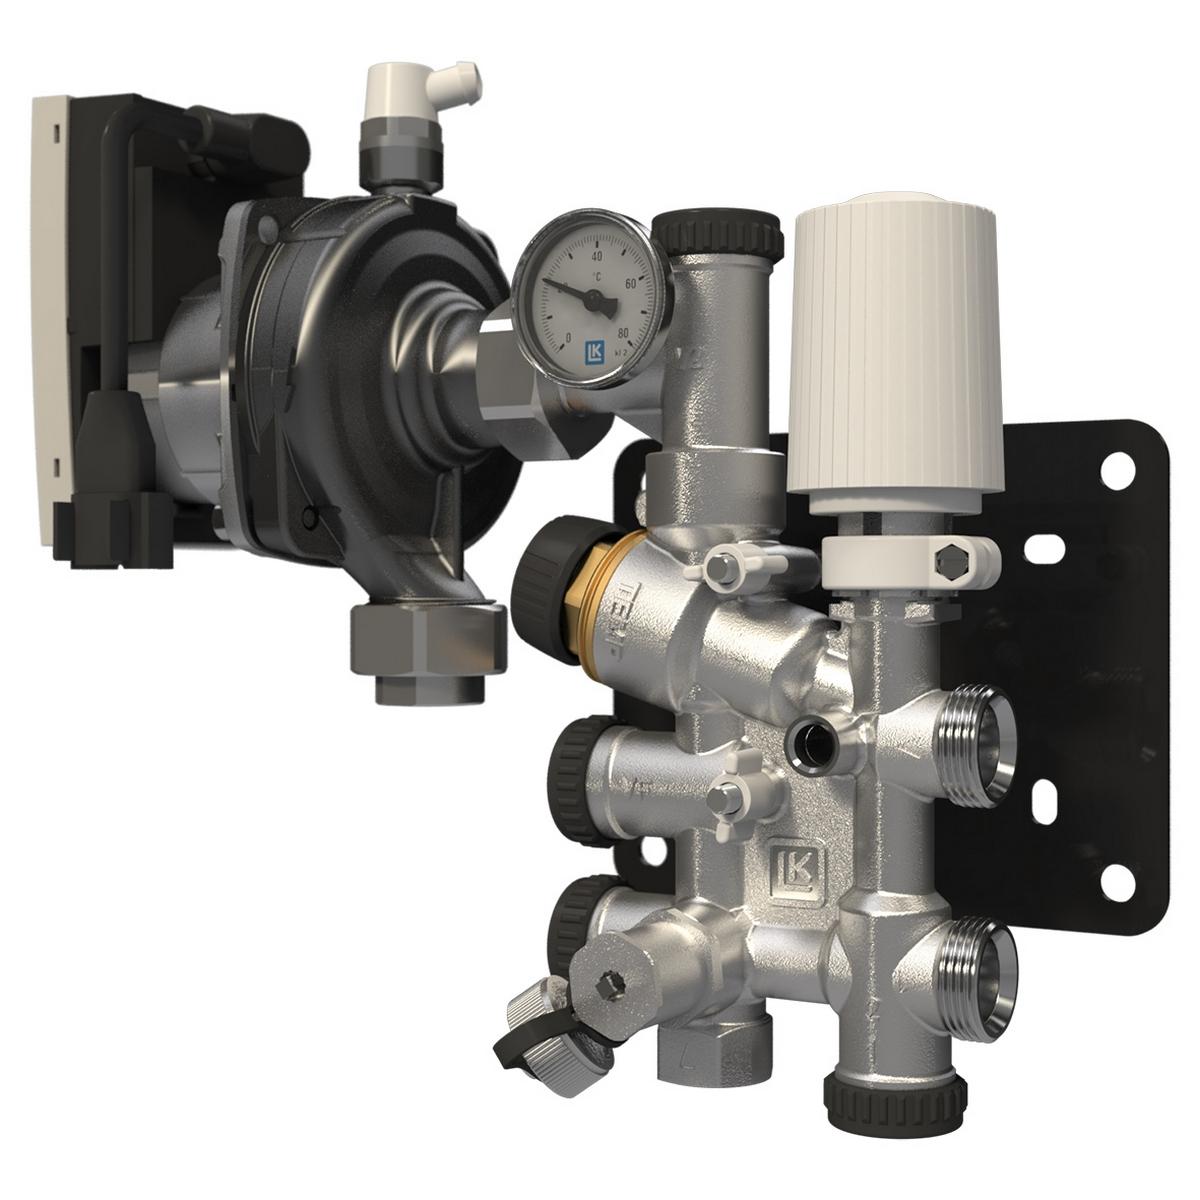 Minishunt LK Systems M60n